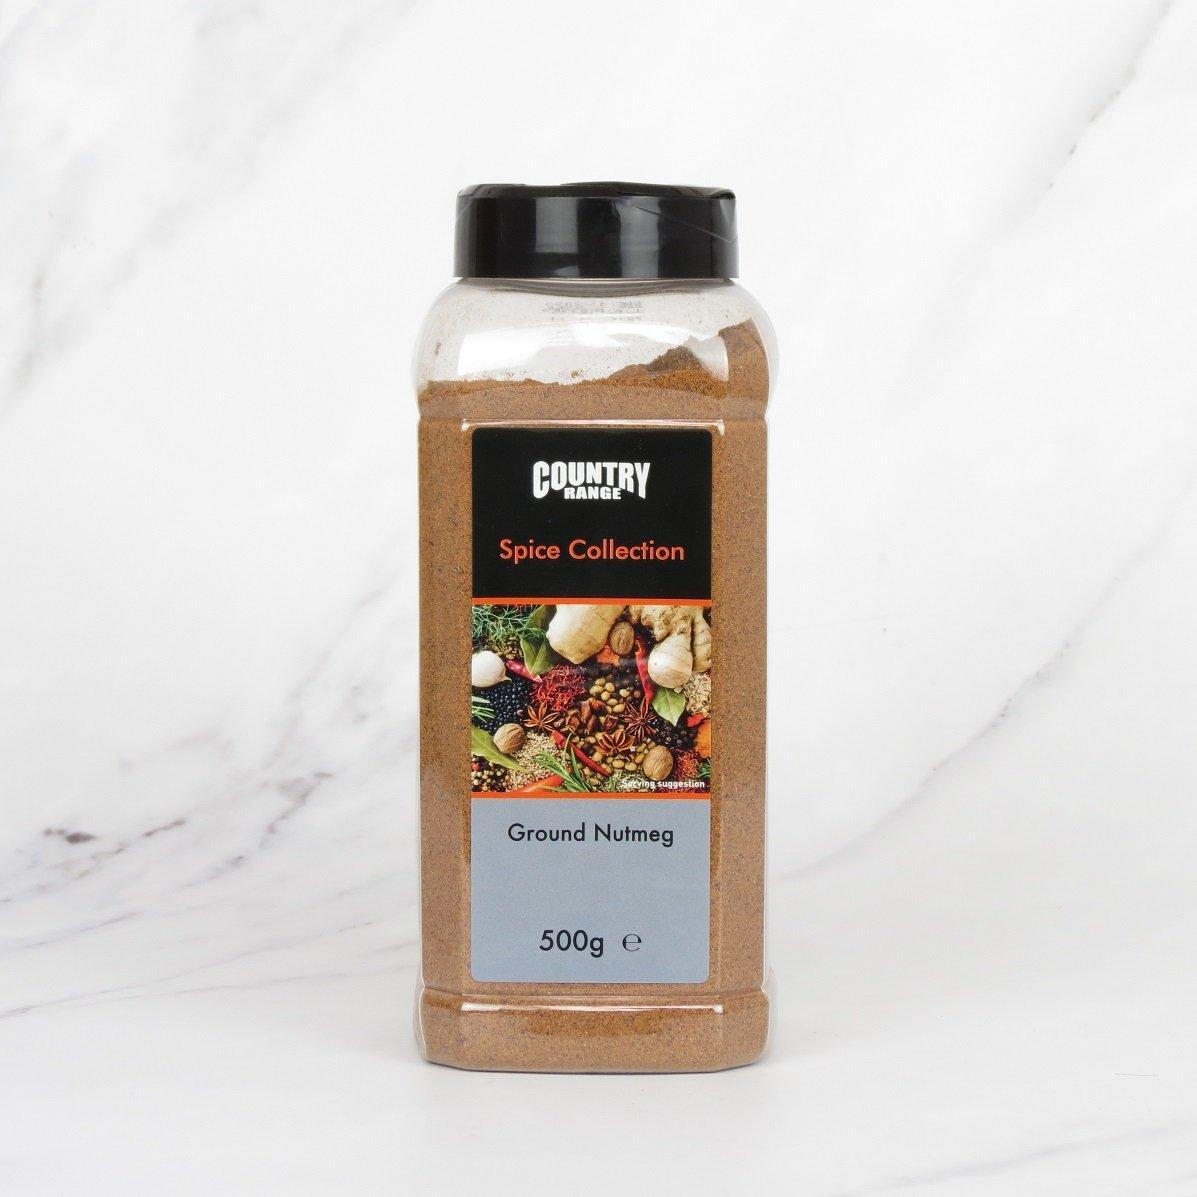 Ground Nutmeg – 500g